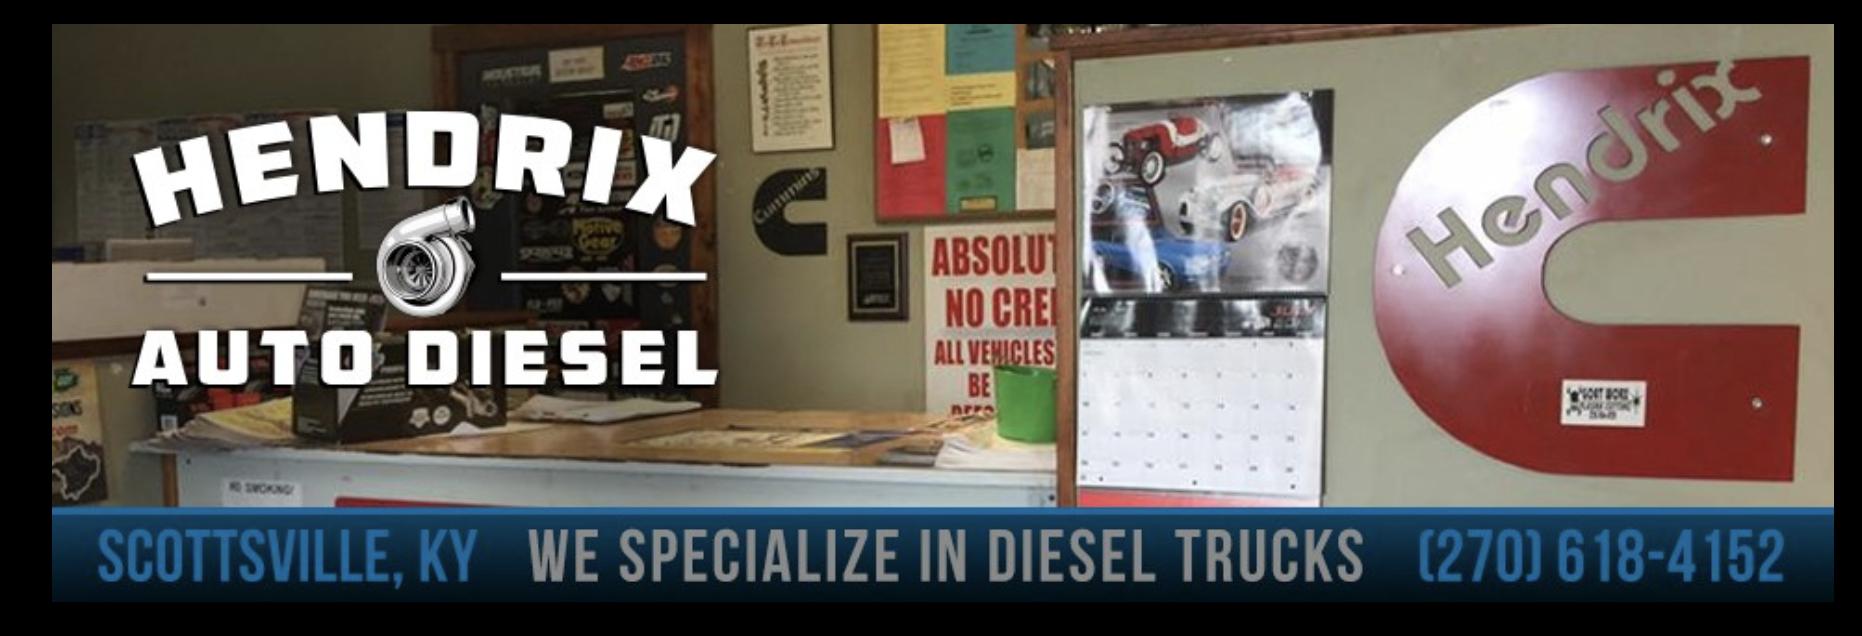 Hendrix Auto Diesel image 0